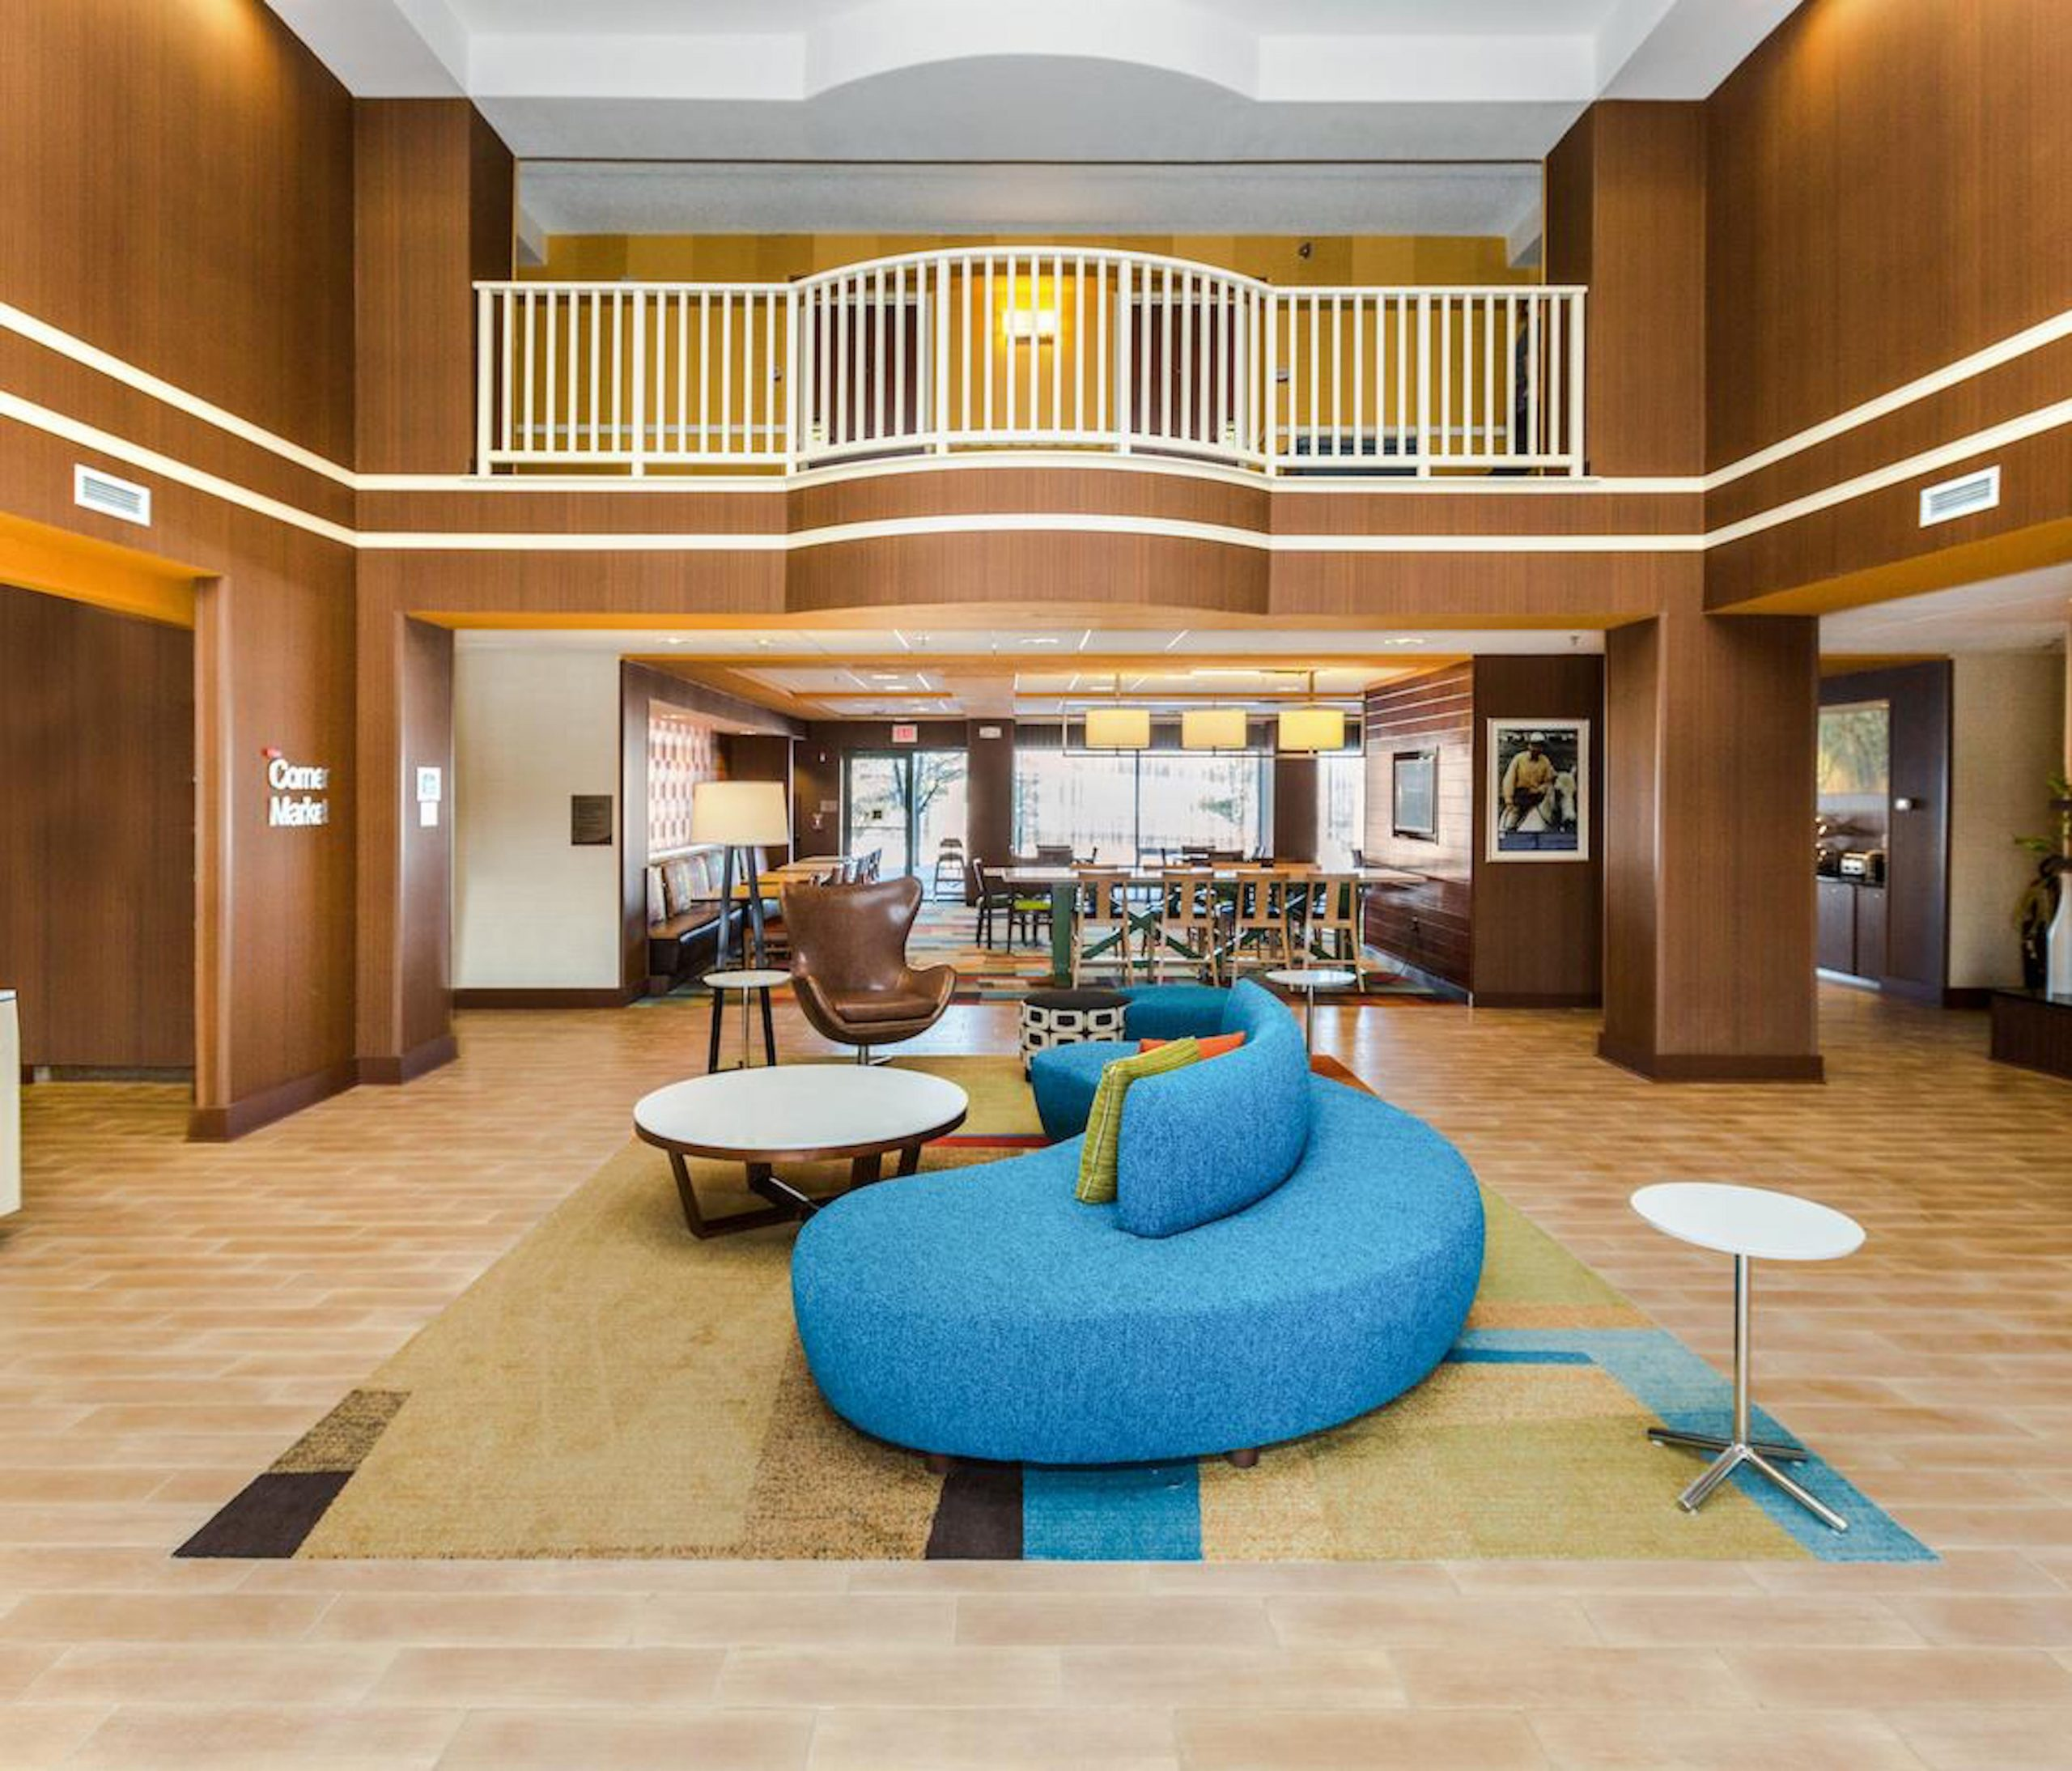 Fairfield Inn & Suites by Marriott Des Moines West Lobby